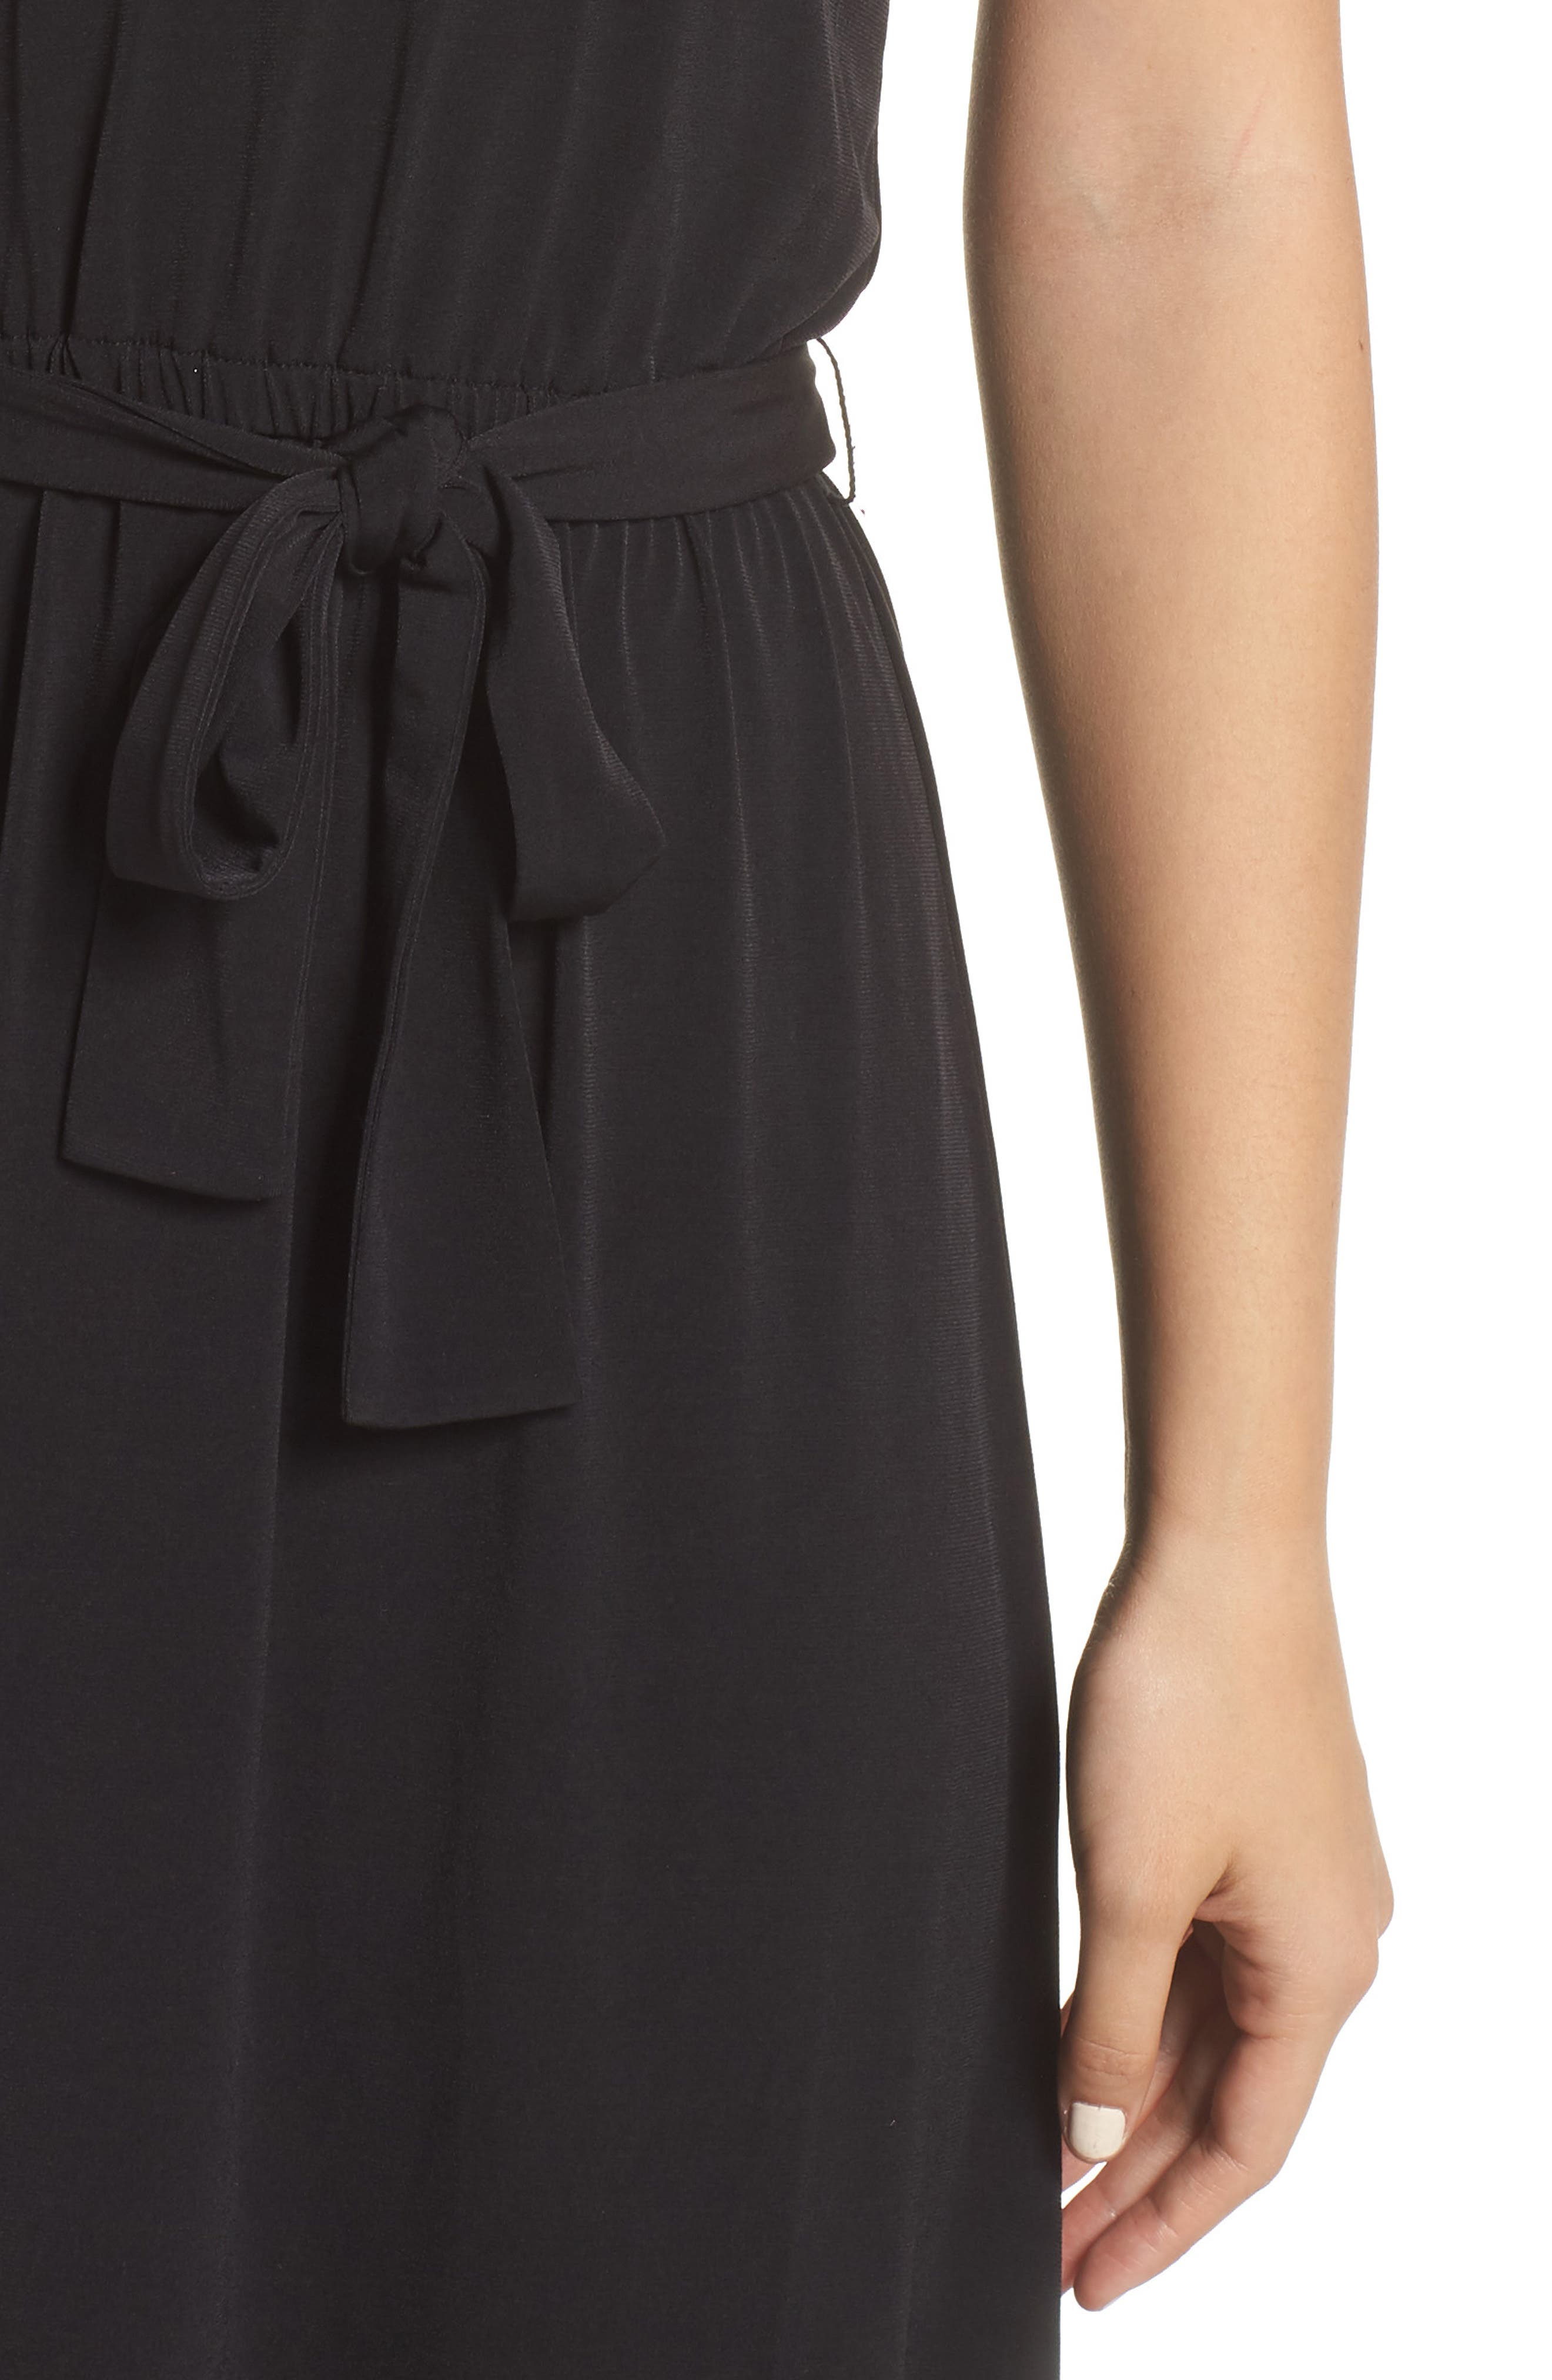 MICHAEL MICHAEL KORS,                             Halter Midi Dress,                             Alternate thumbnail 5, color,                             BLACK